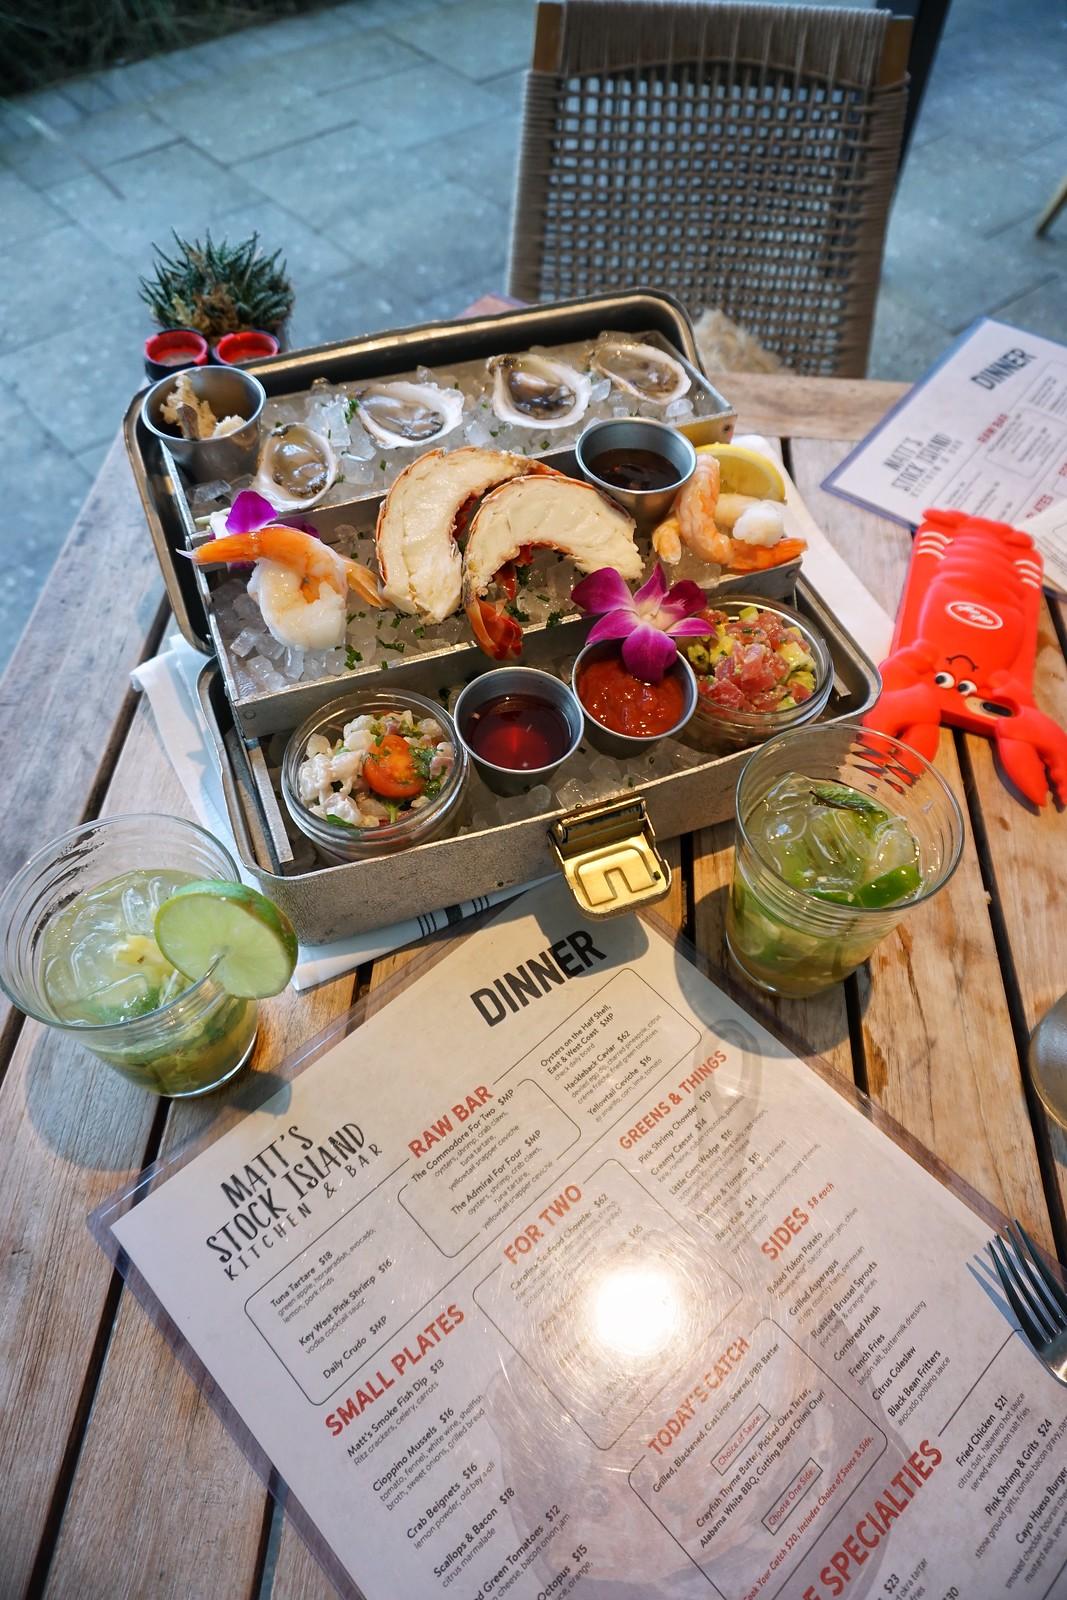 matts-stock-island-restaurant-seafood-ultimate-road-trip-5-days-florida-keys-itinerary-what-to-do-key-west-key-largo-islamorada-marathon-miami-vacation-guide